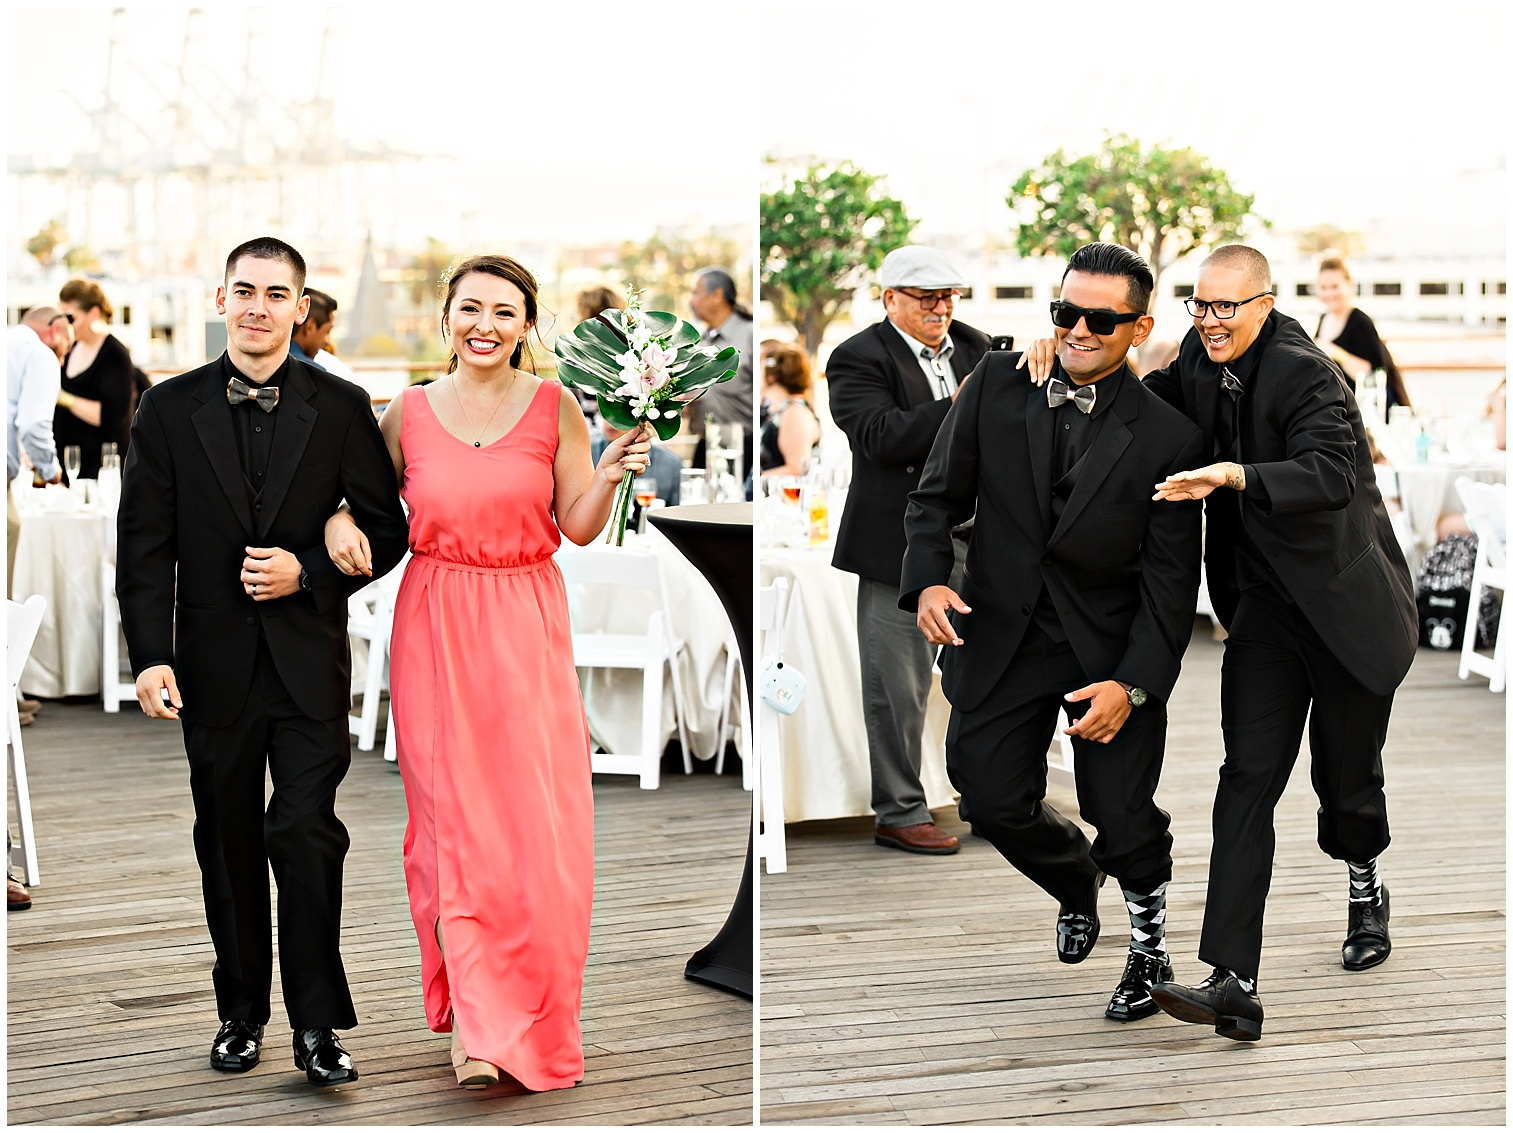 Queen_Mary_Long_Beach_Wedding_Photography_0485.jpg